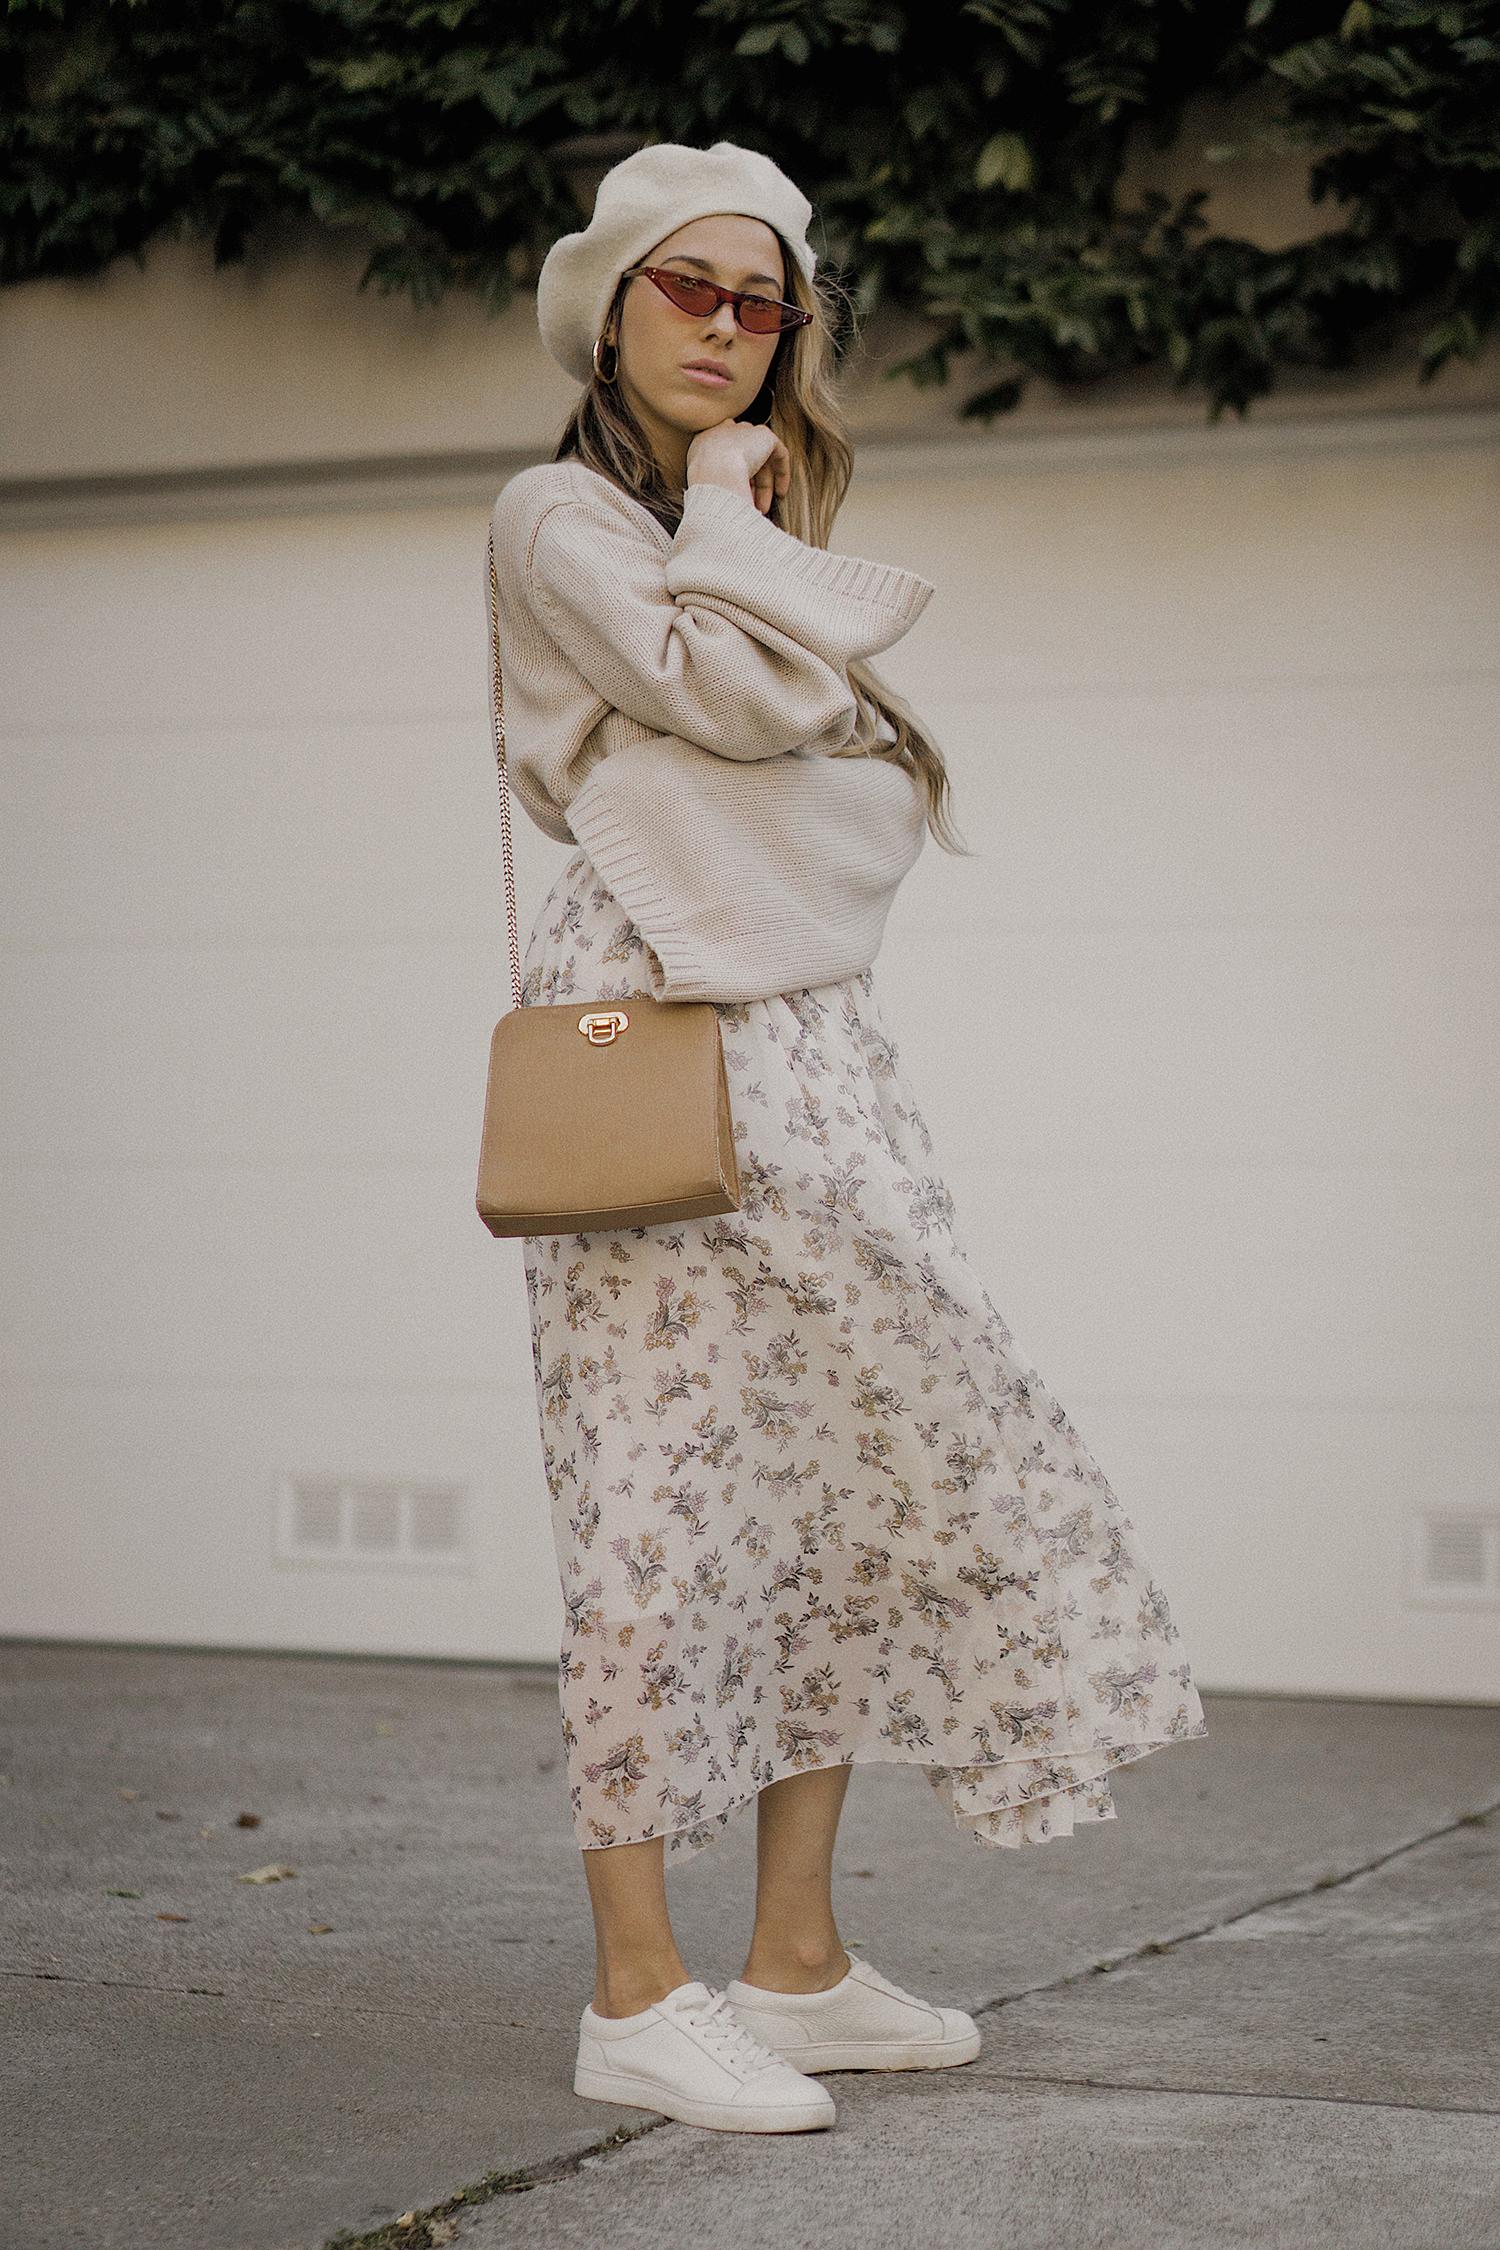 neutral_outfit_street_style_look_beige_tobi_sweater_long_skirt_romantic_beret_sneakers_vintage_lena_juice_the_white_ocean_06